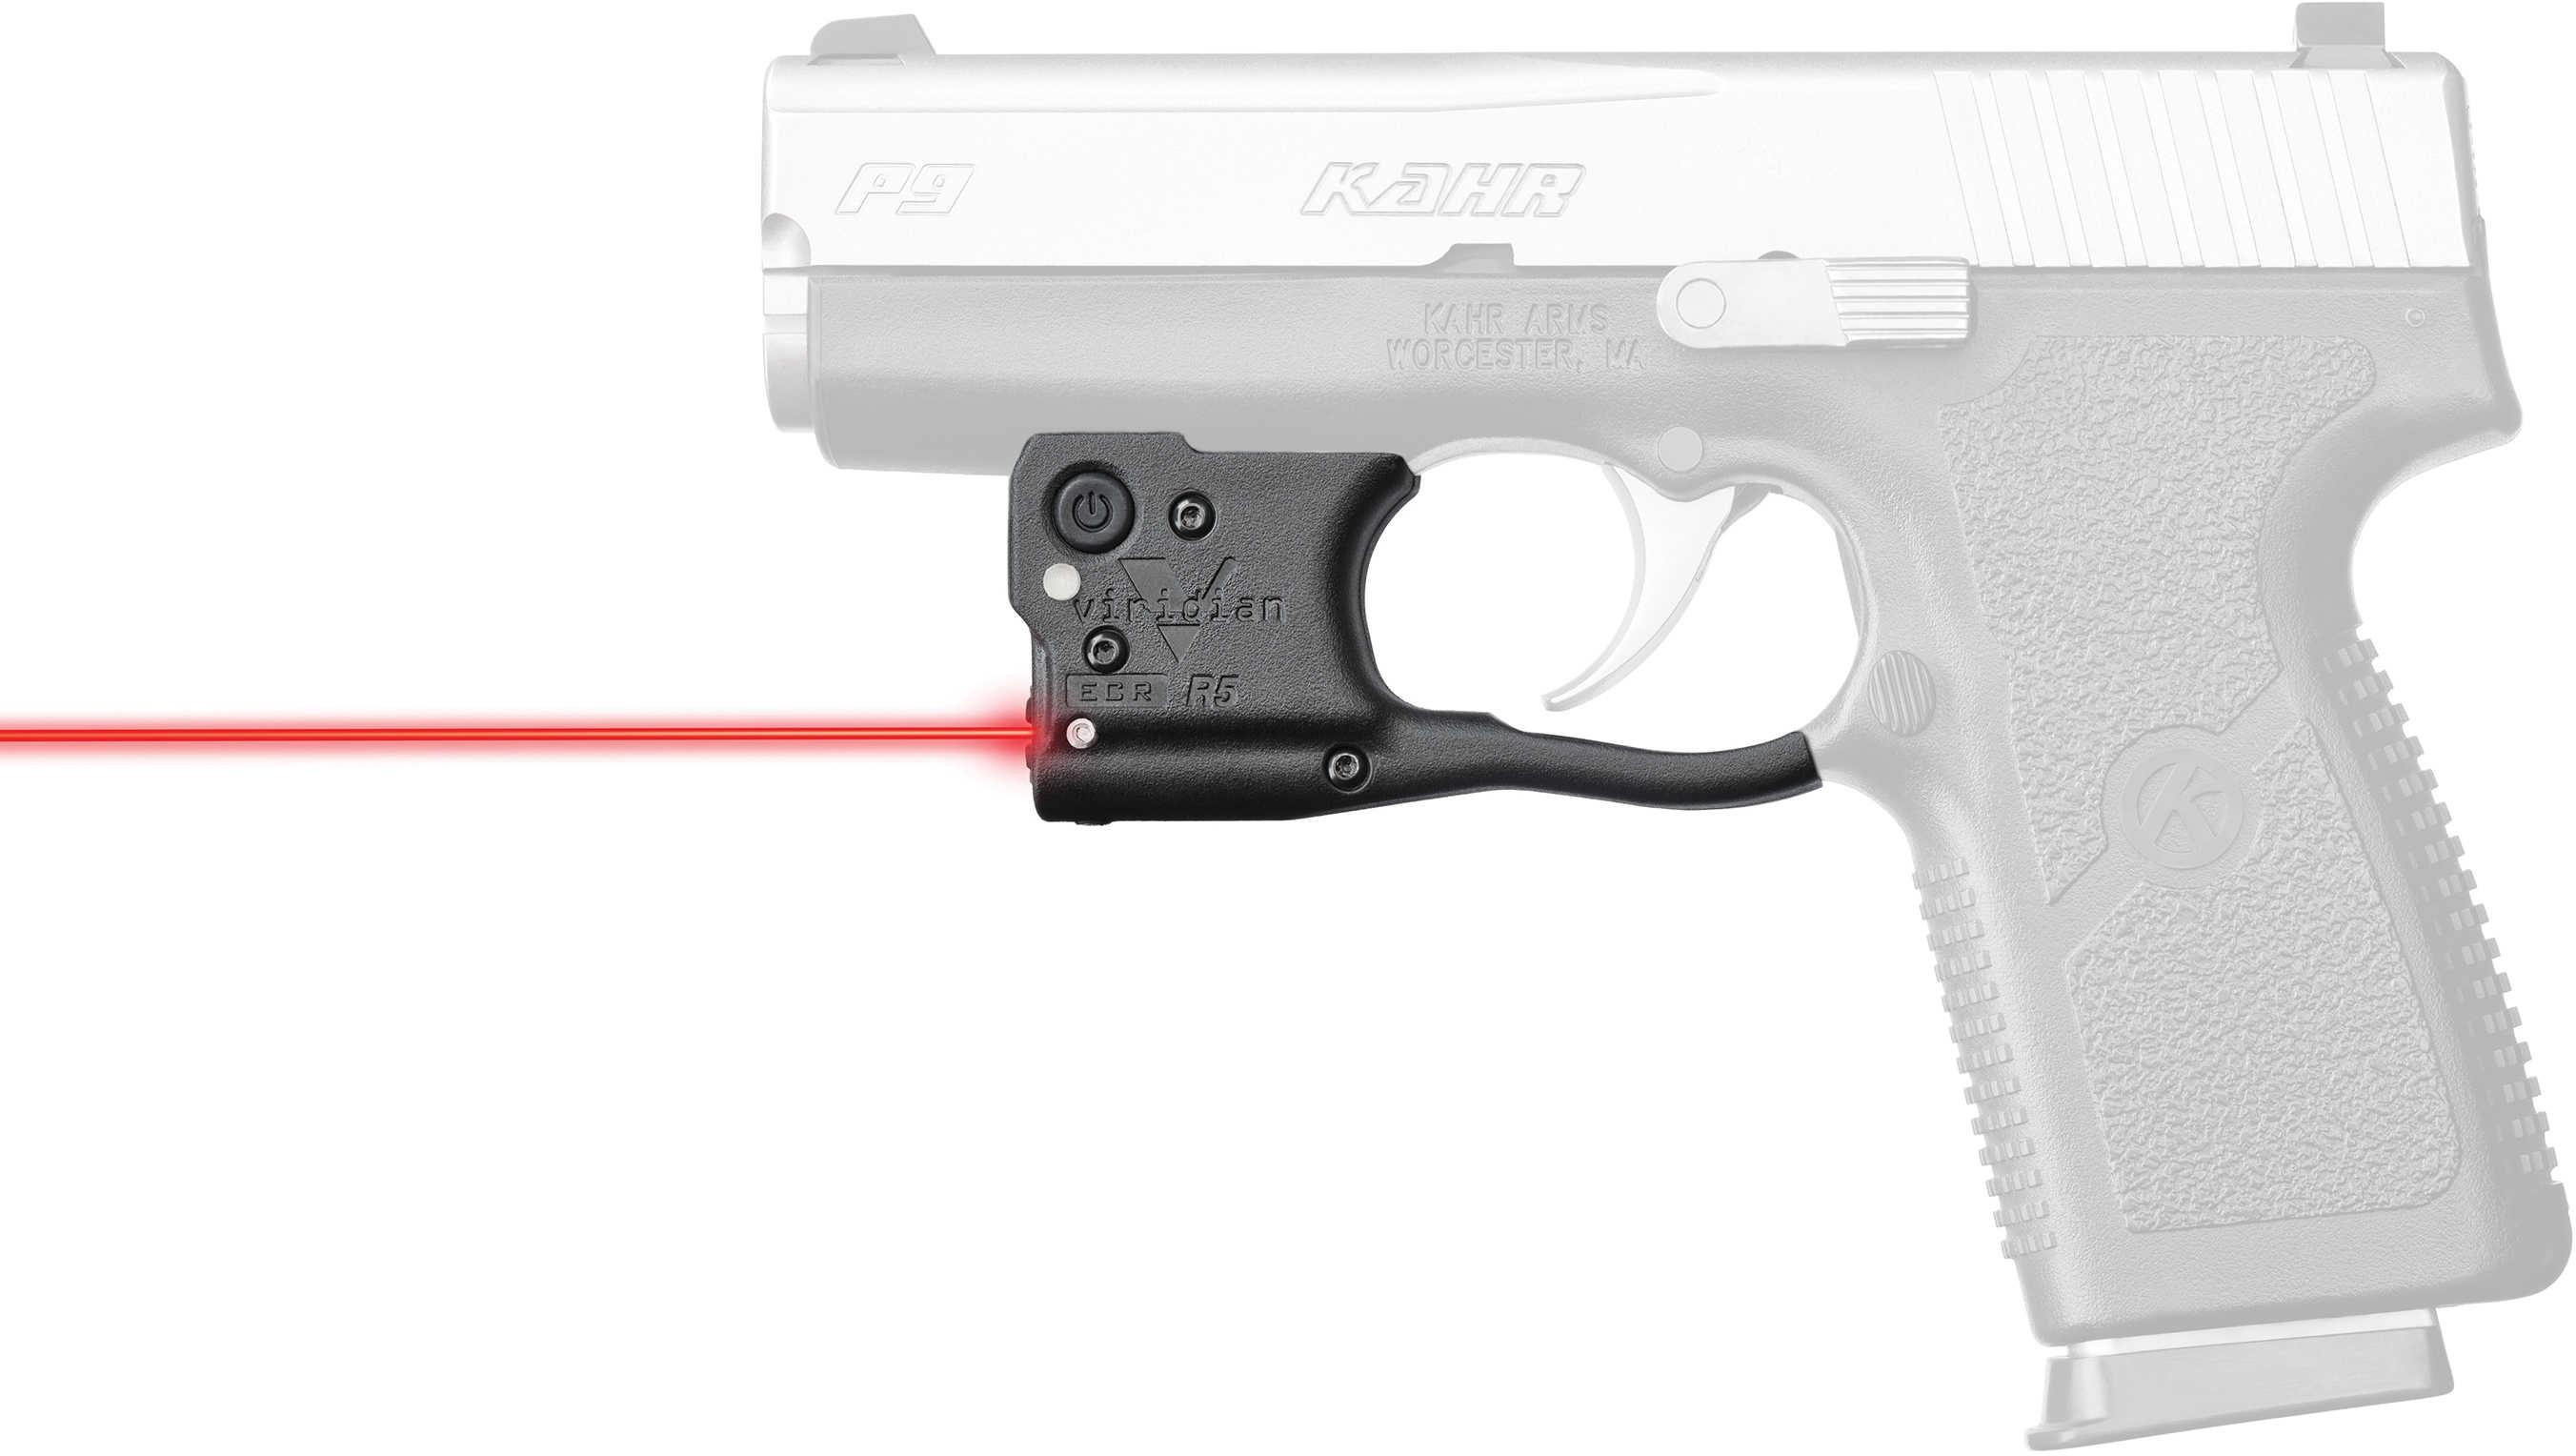 Reactor 5 Gen II Red Laser Kahr Arms 9mm/.40 with ECR Instant On Holster, Black